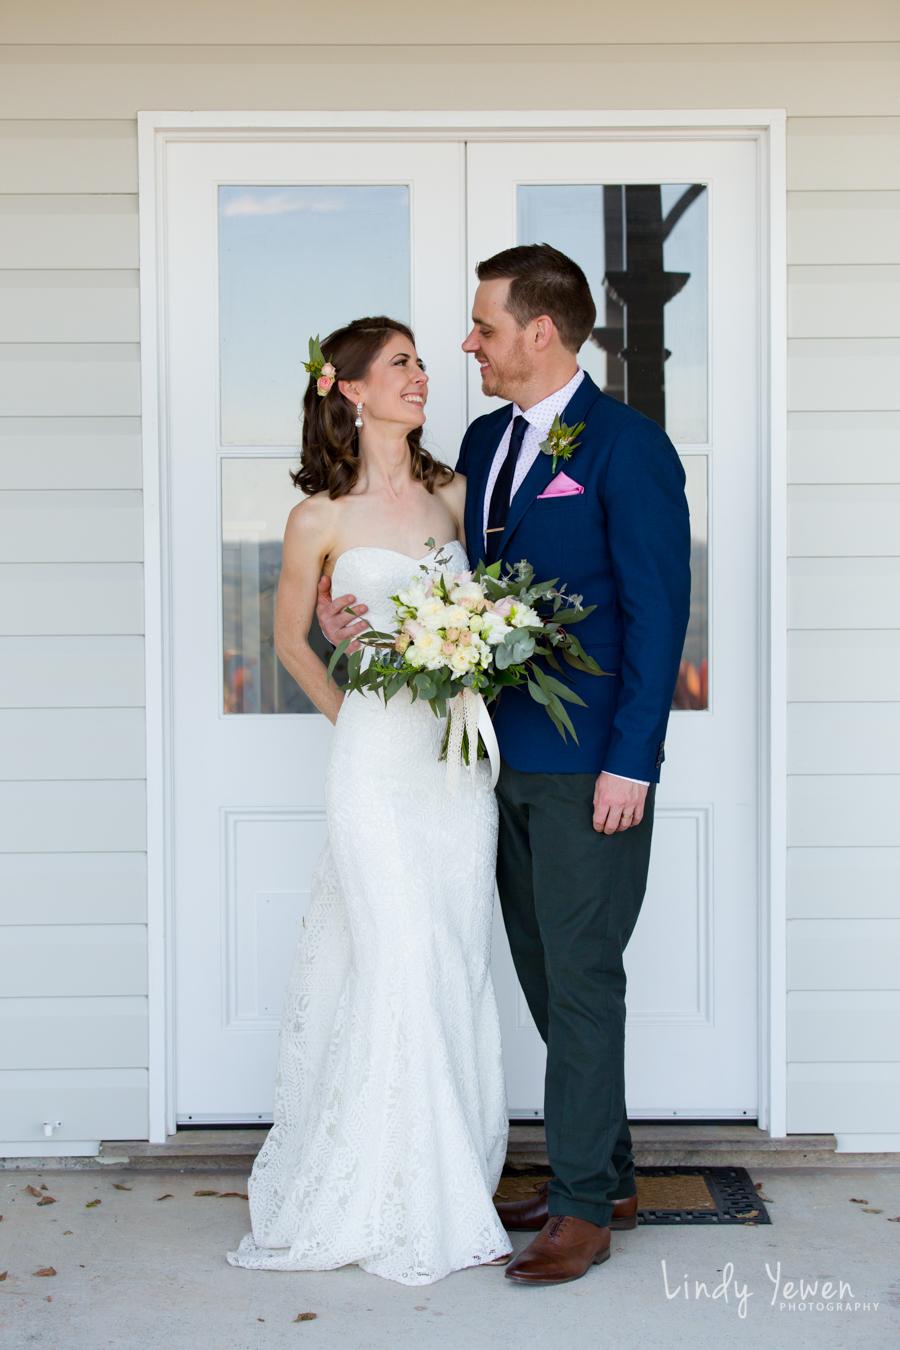 Montville-wedding-photographer-Lauren-Kirby 313.jpg